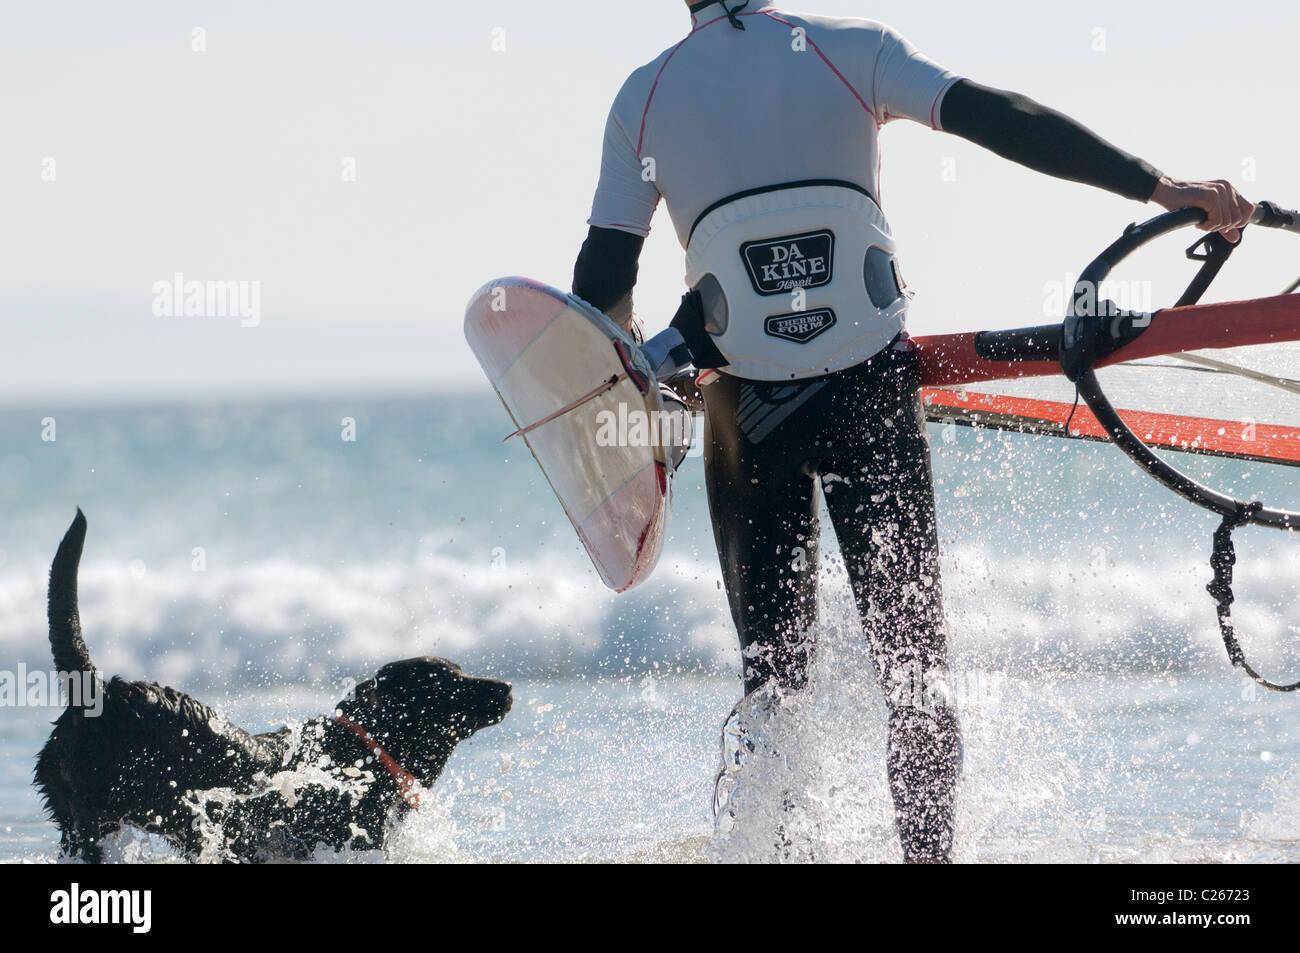 Man and his pet dog at the beach. - Stock Image